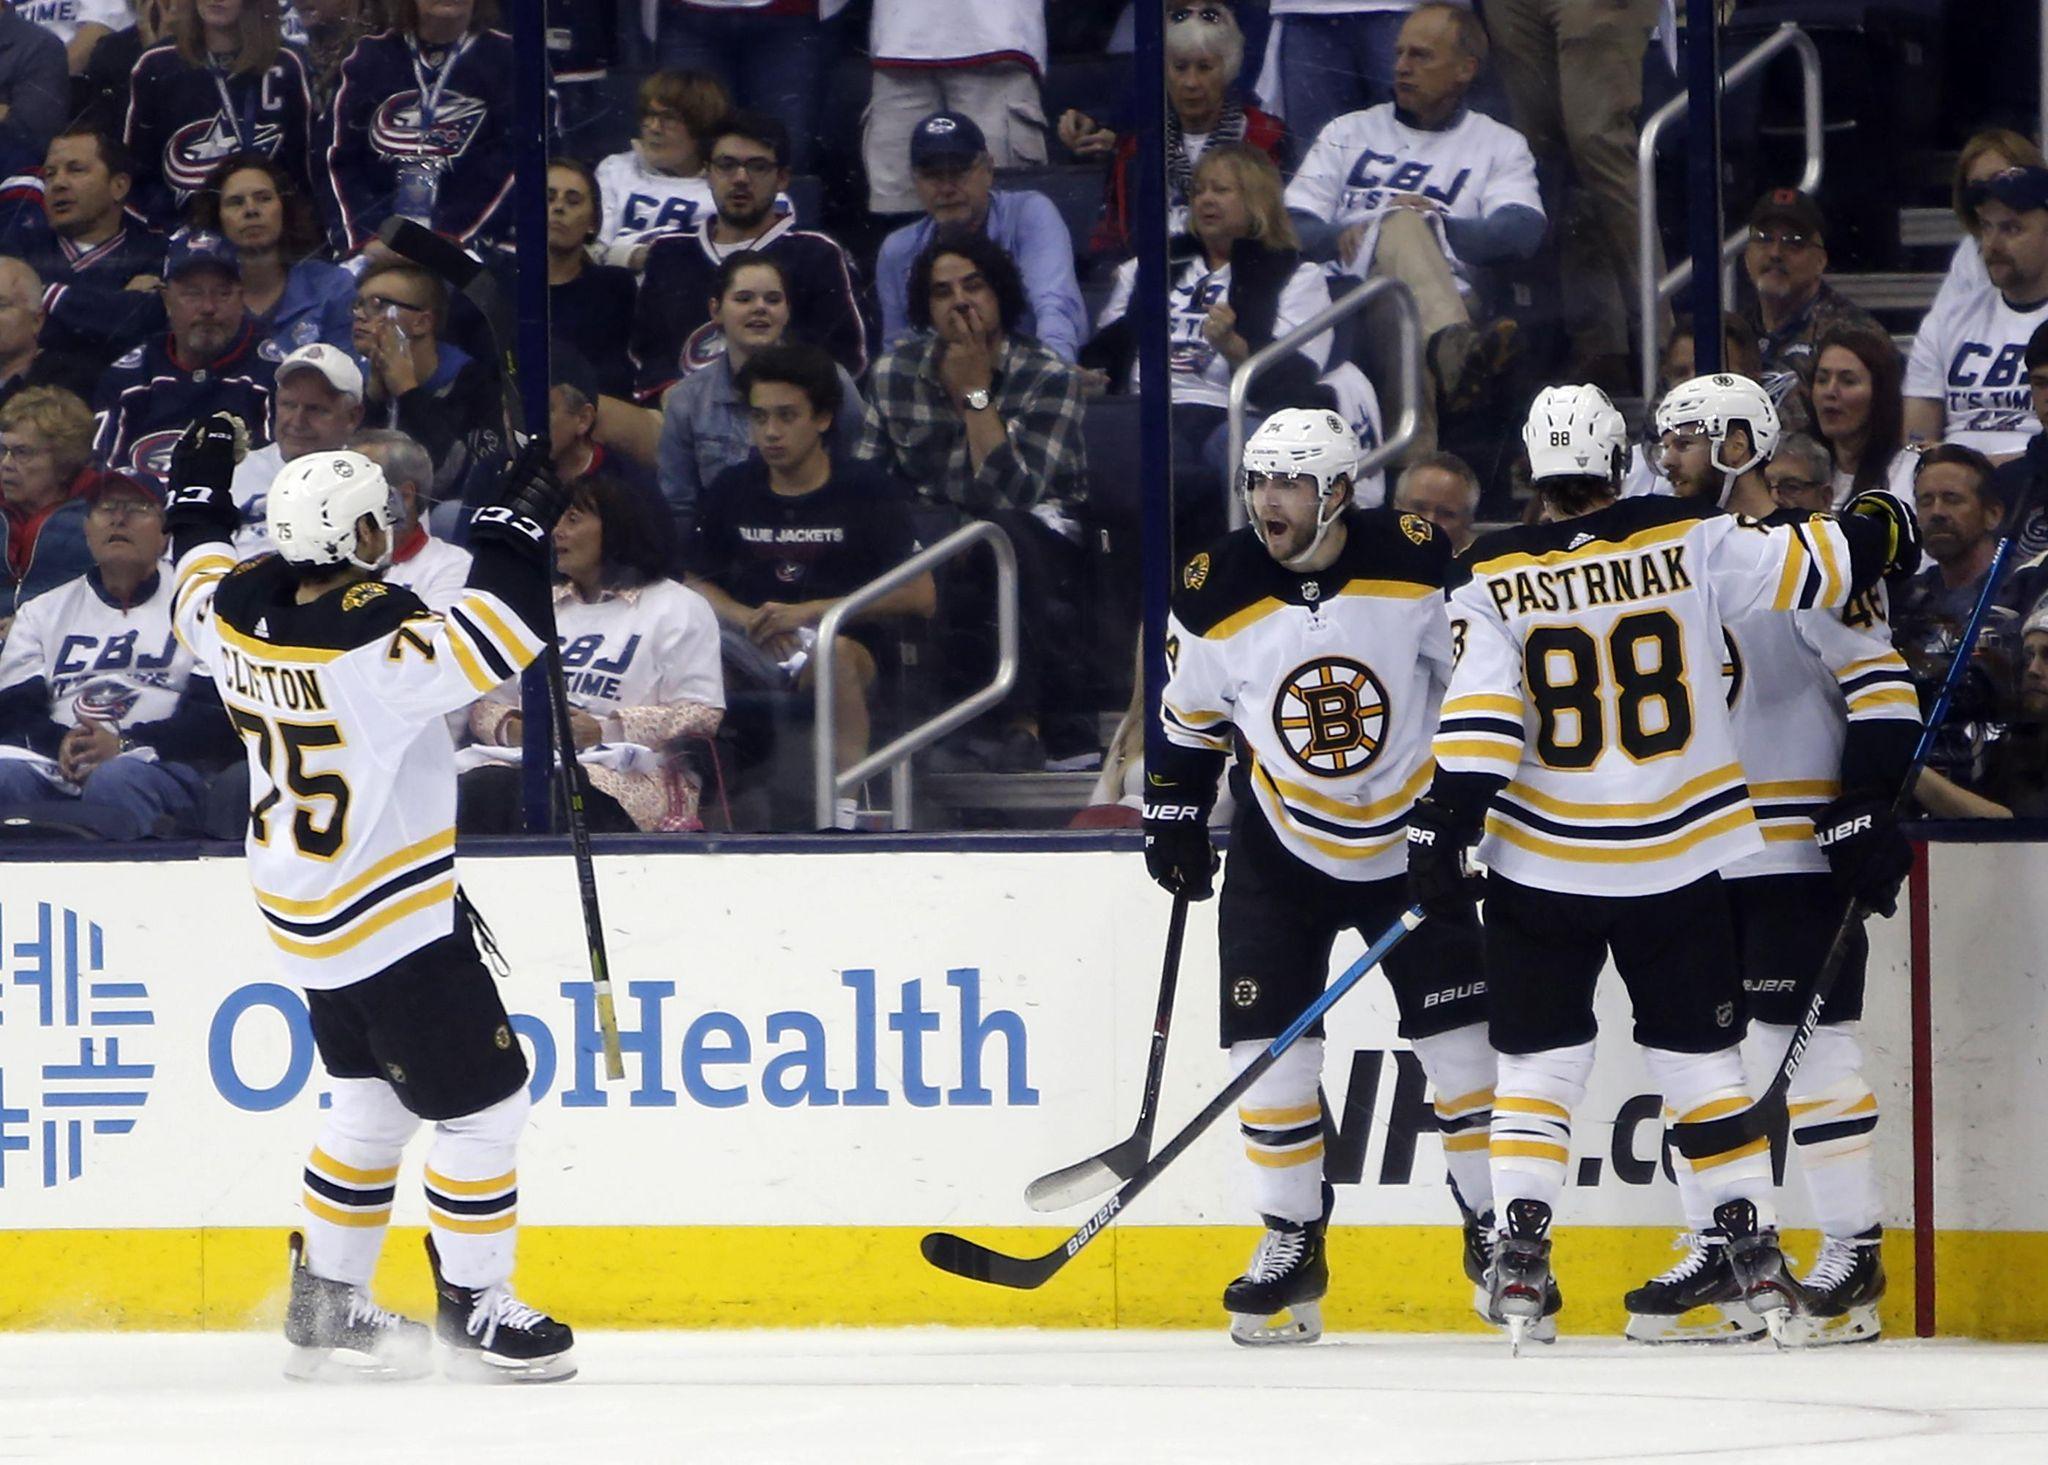 Bruins_blue_jackets_hockey_07481_s2048x1465